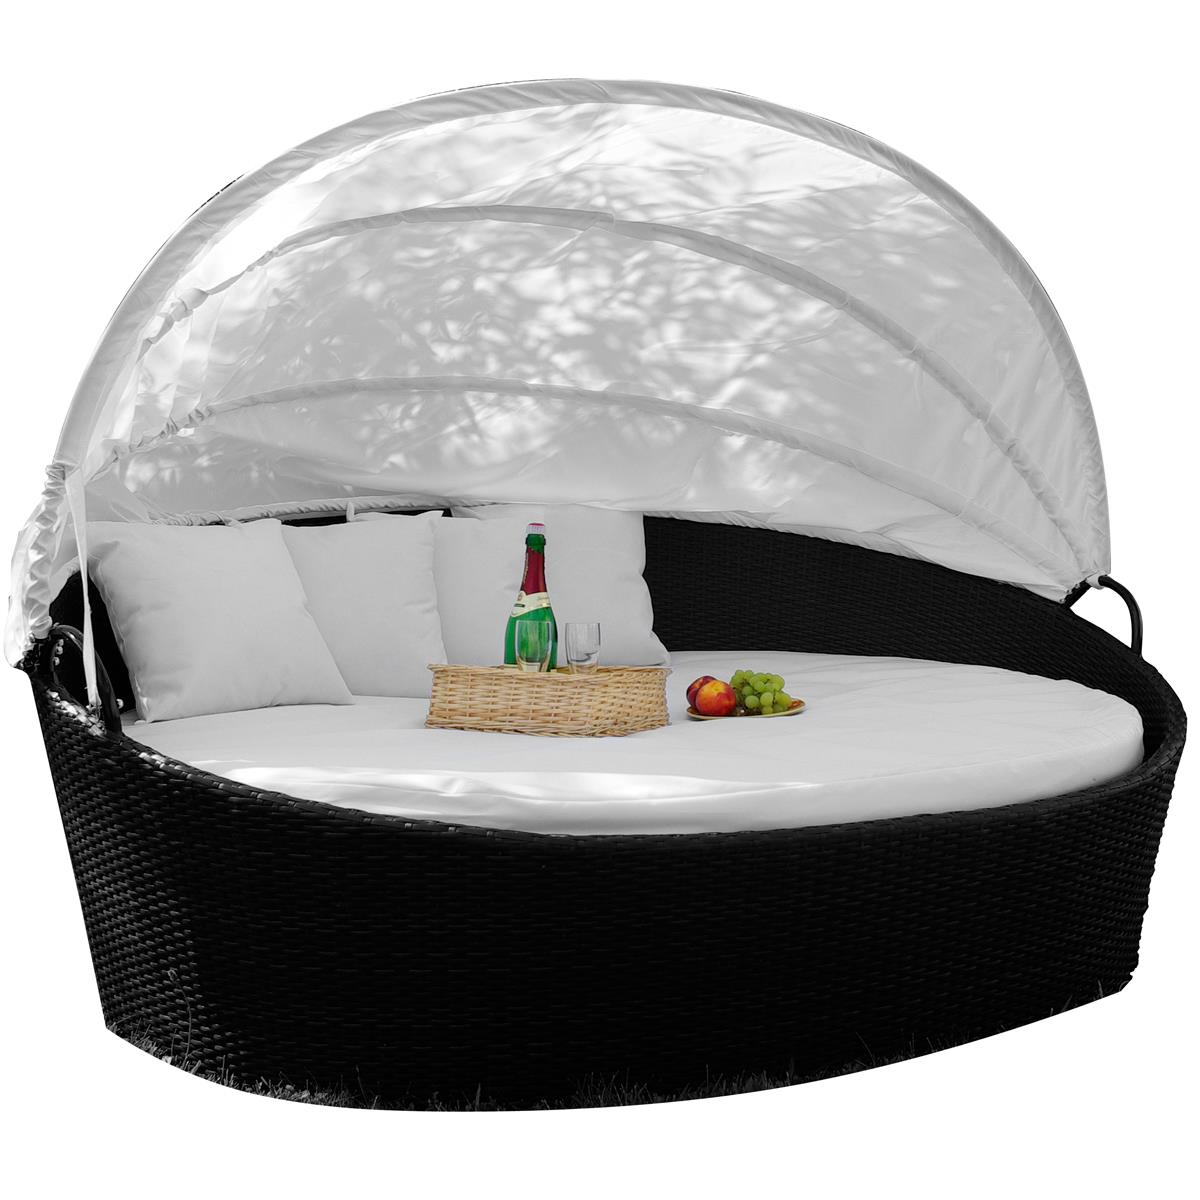 Exklusive Sonneninsel Poly Rattan Lounge Rattanbett Sonnenliege Relaxinsel weiß